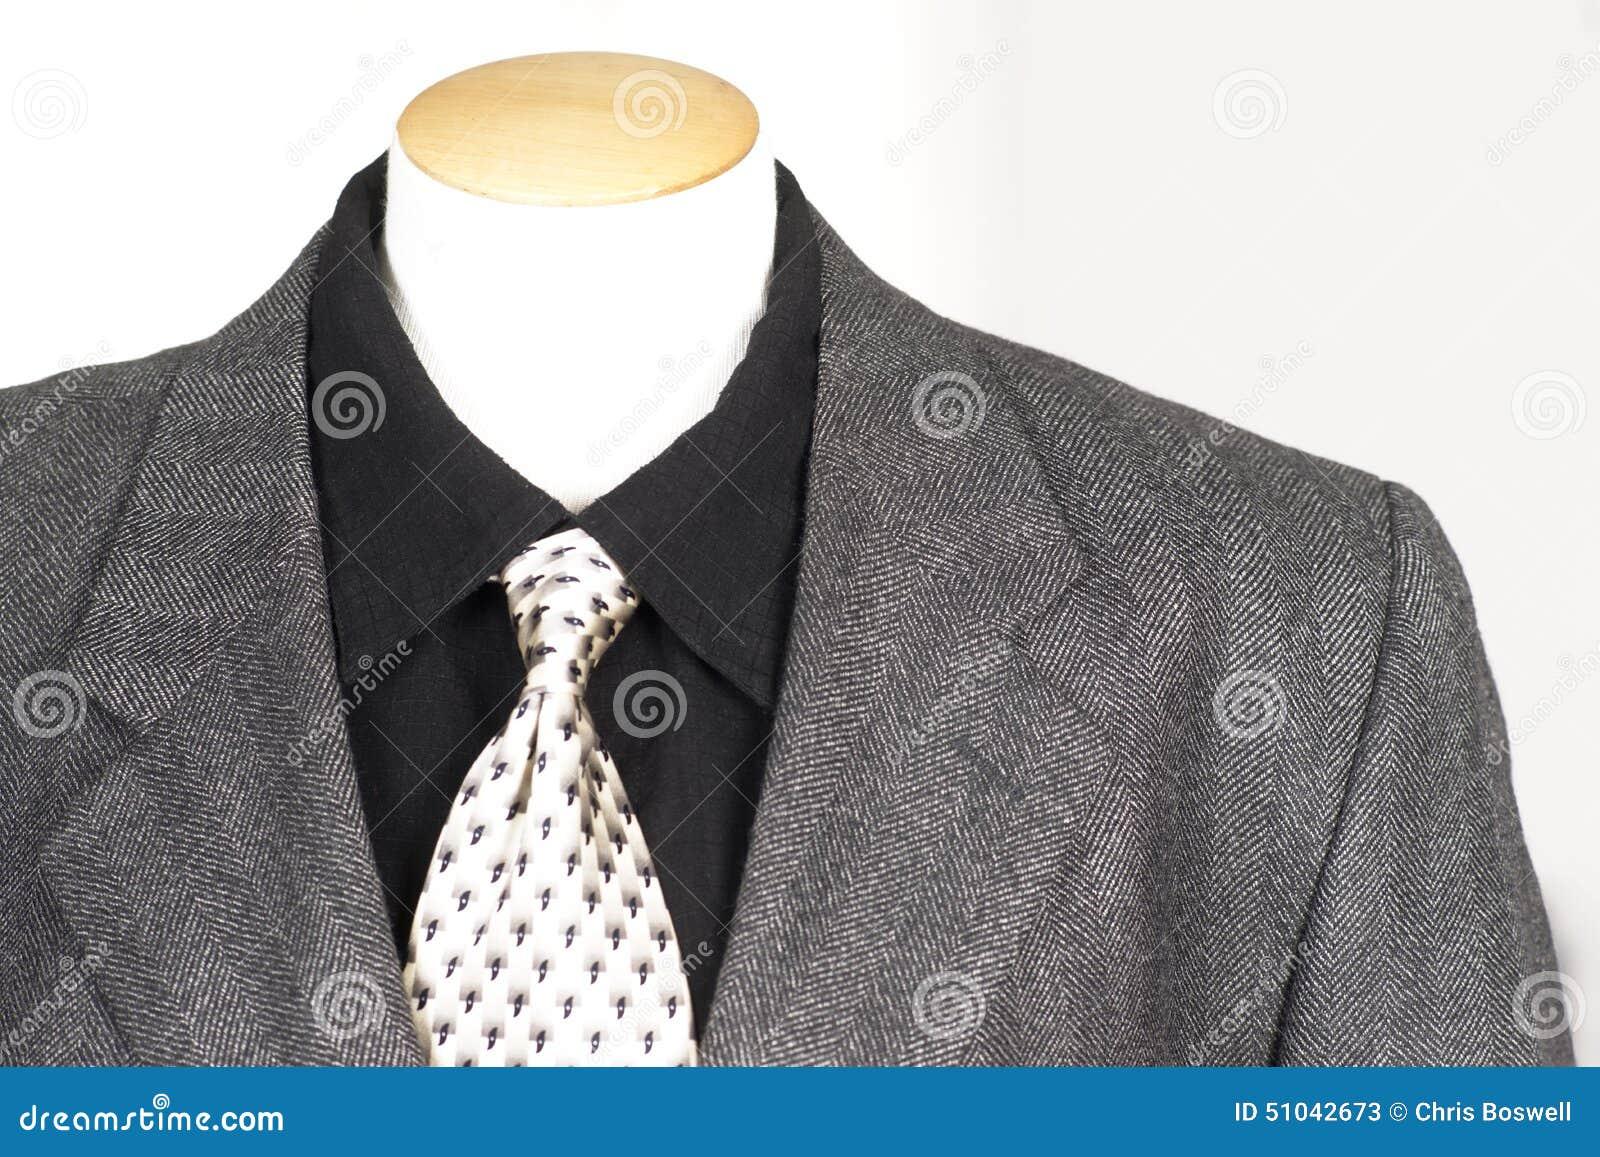 Stock Photo: Suit Shirt Tie Department Store Mannequin Display